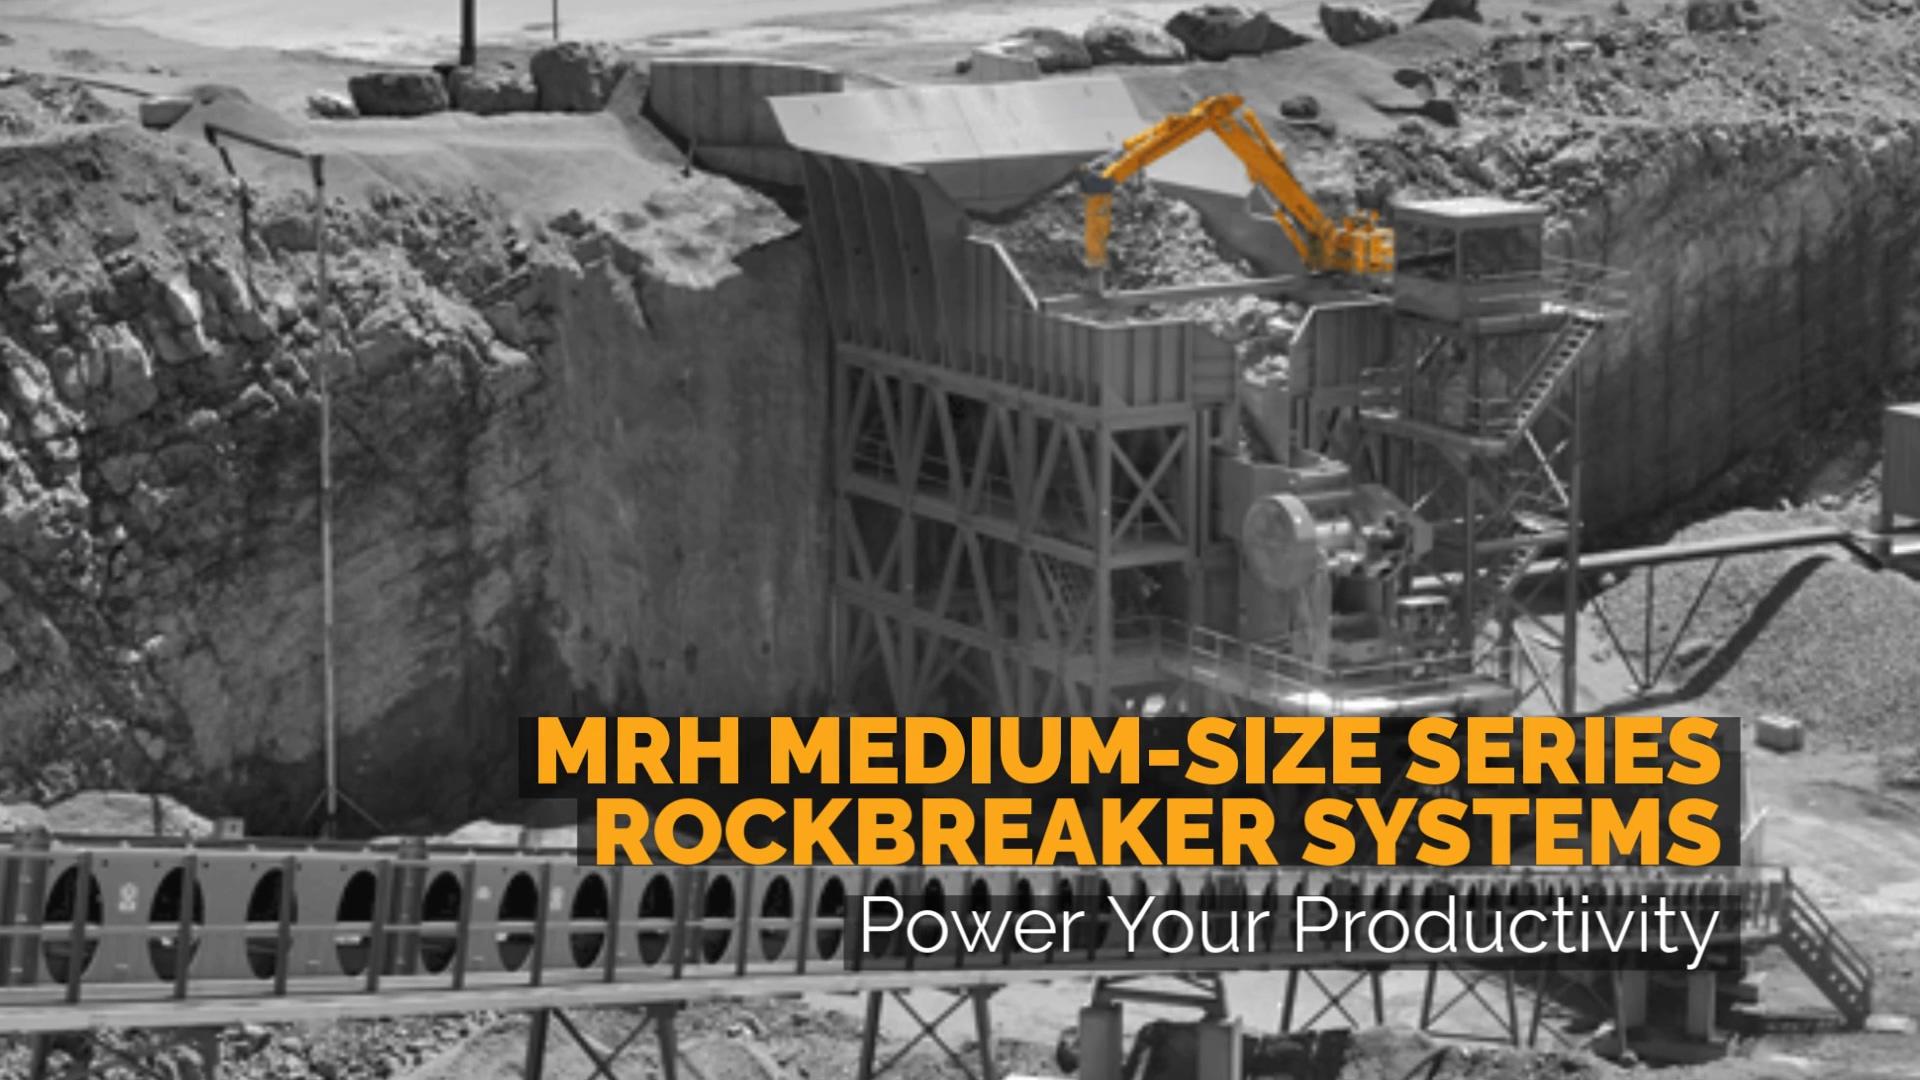 Breaker_Technology__MRH_Medium-Size_Series_Rockbreaker_System__Power_Your_Productivity_1080p